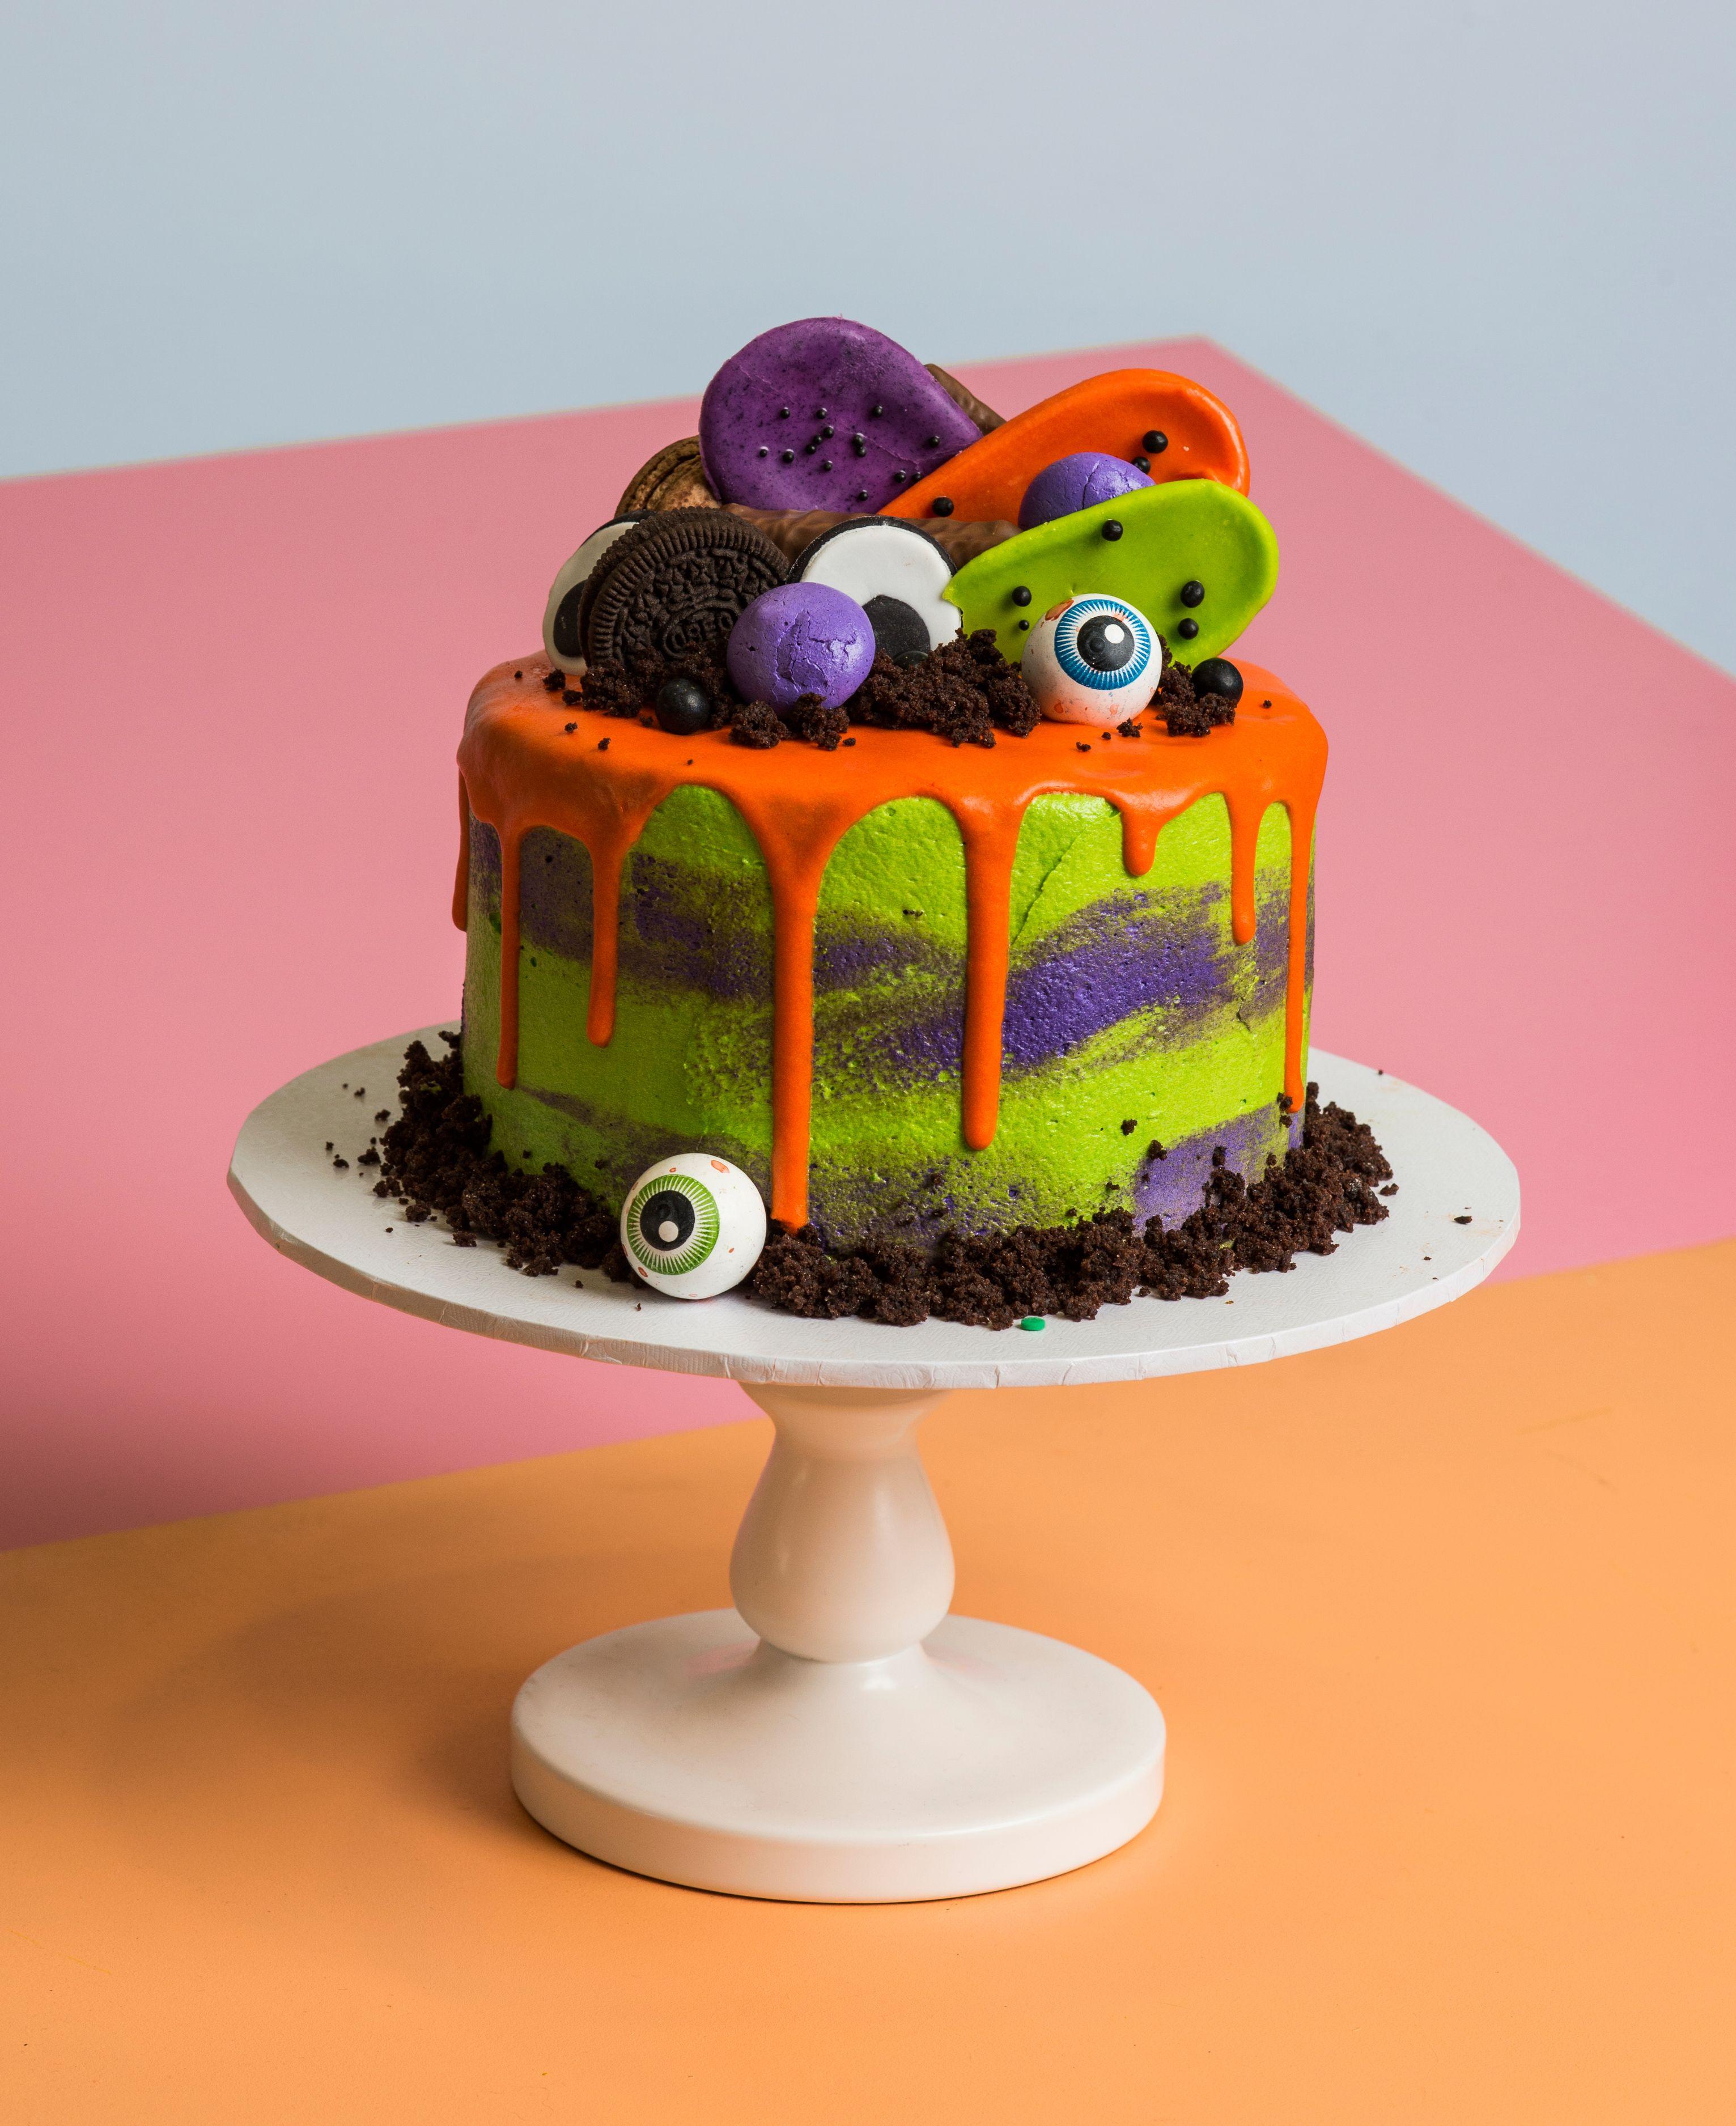 Halloween Drip Cake Halloween Treats Pinterest Drip cakes